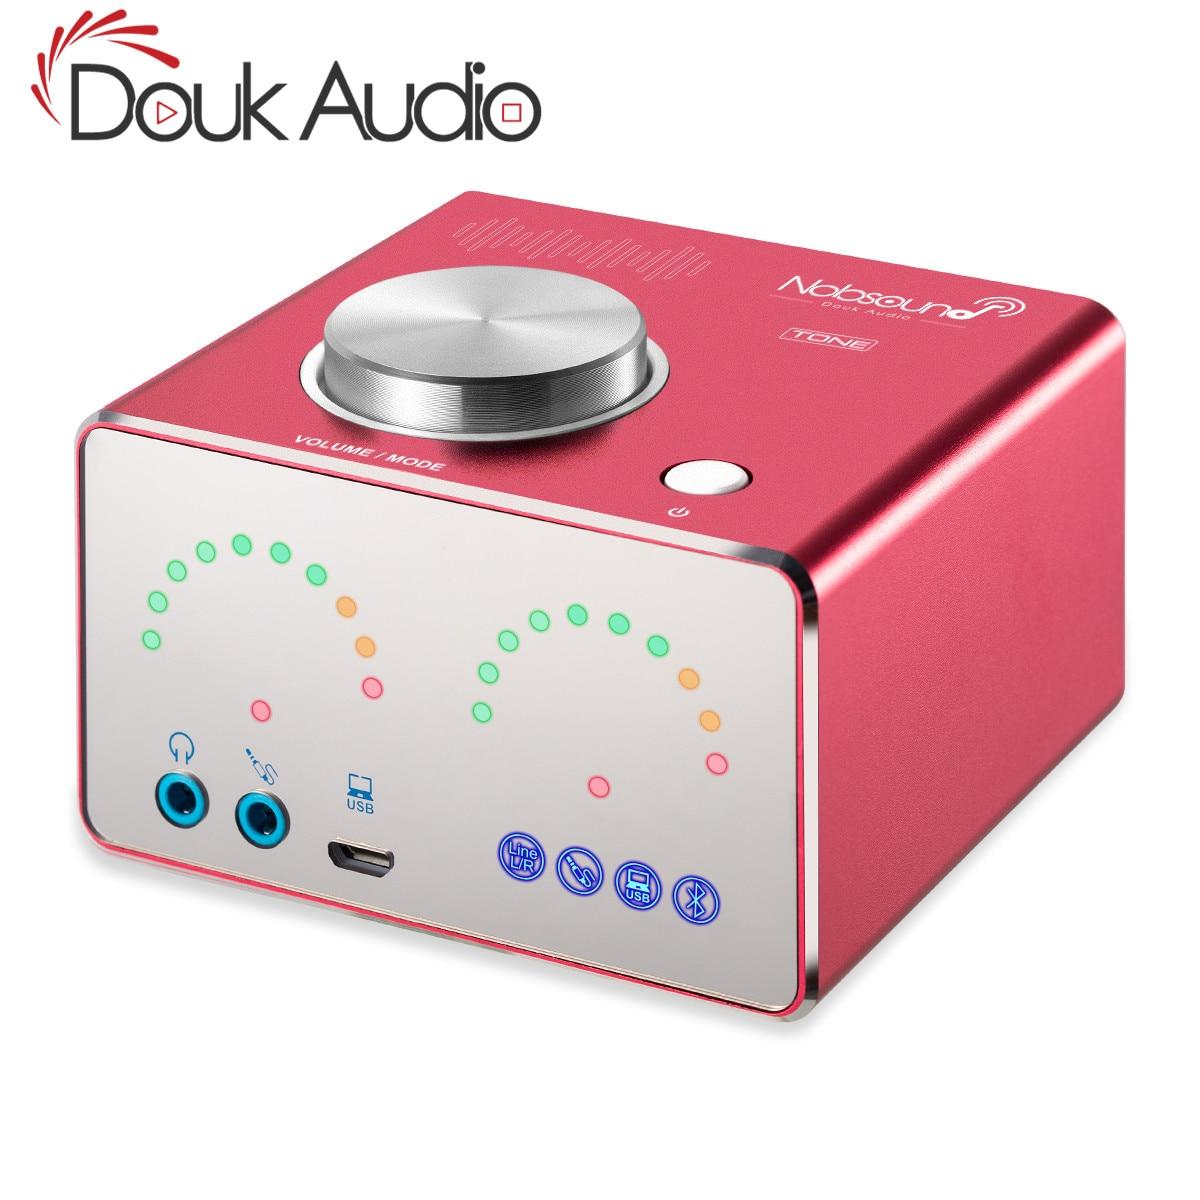 Douk audio Mini Bluetooth 4.2 Desktop Integrated HiFi TPA3116 Digital Power Amplifiers Stereo USB Sound Card Headphone Amp douk audio mini bluetooth 4 2 desktop integrated hifi tpa3116 digital power amplifiers stereo usb sound card headphone amp